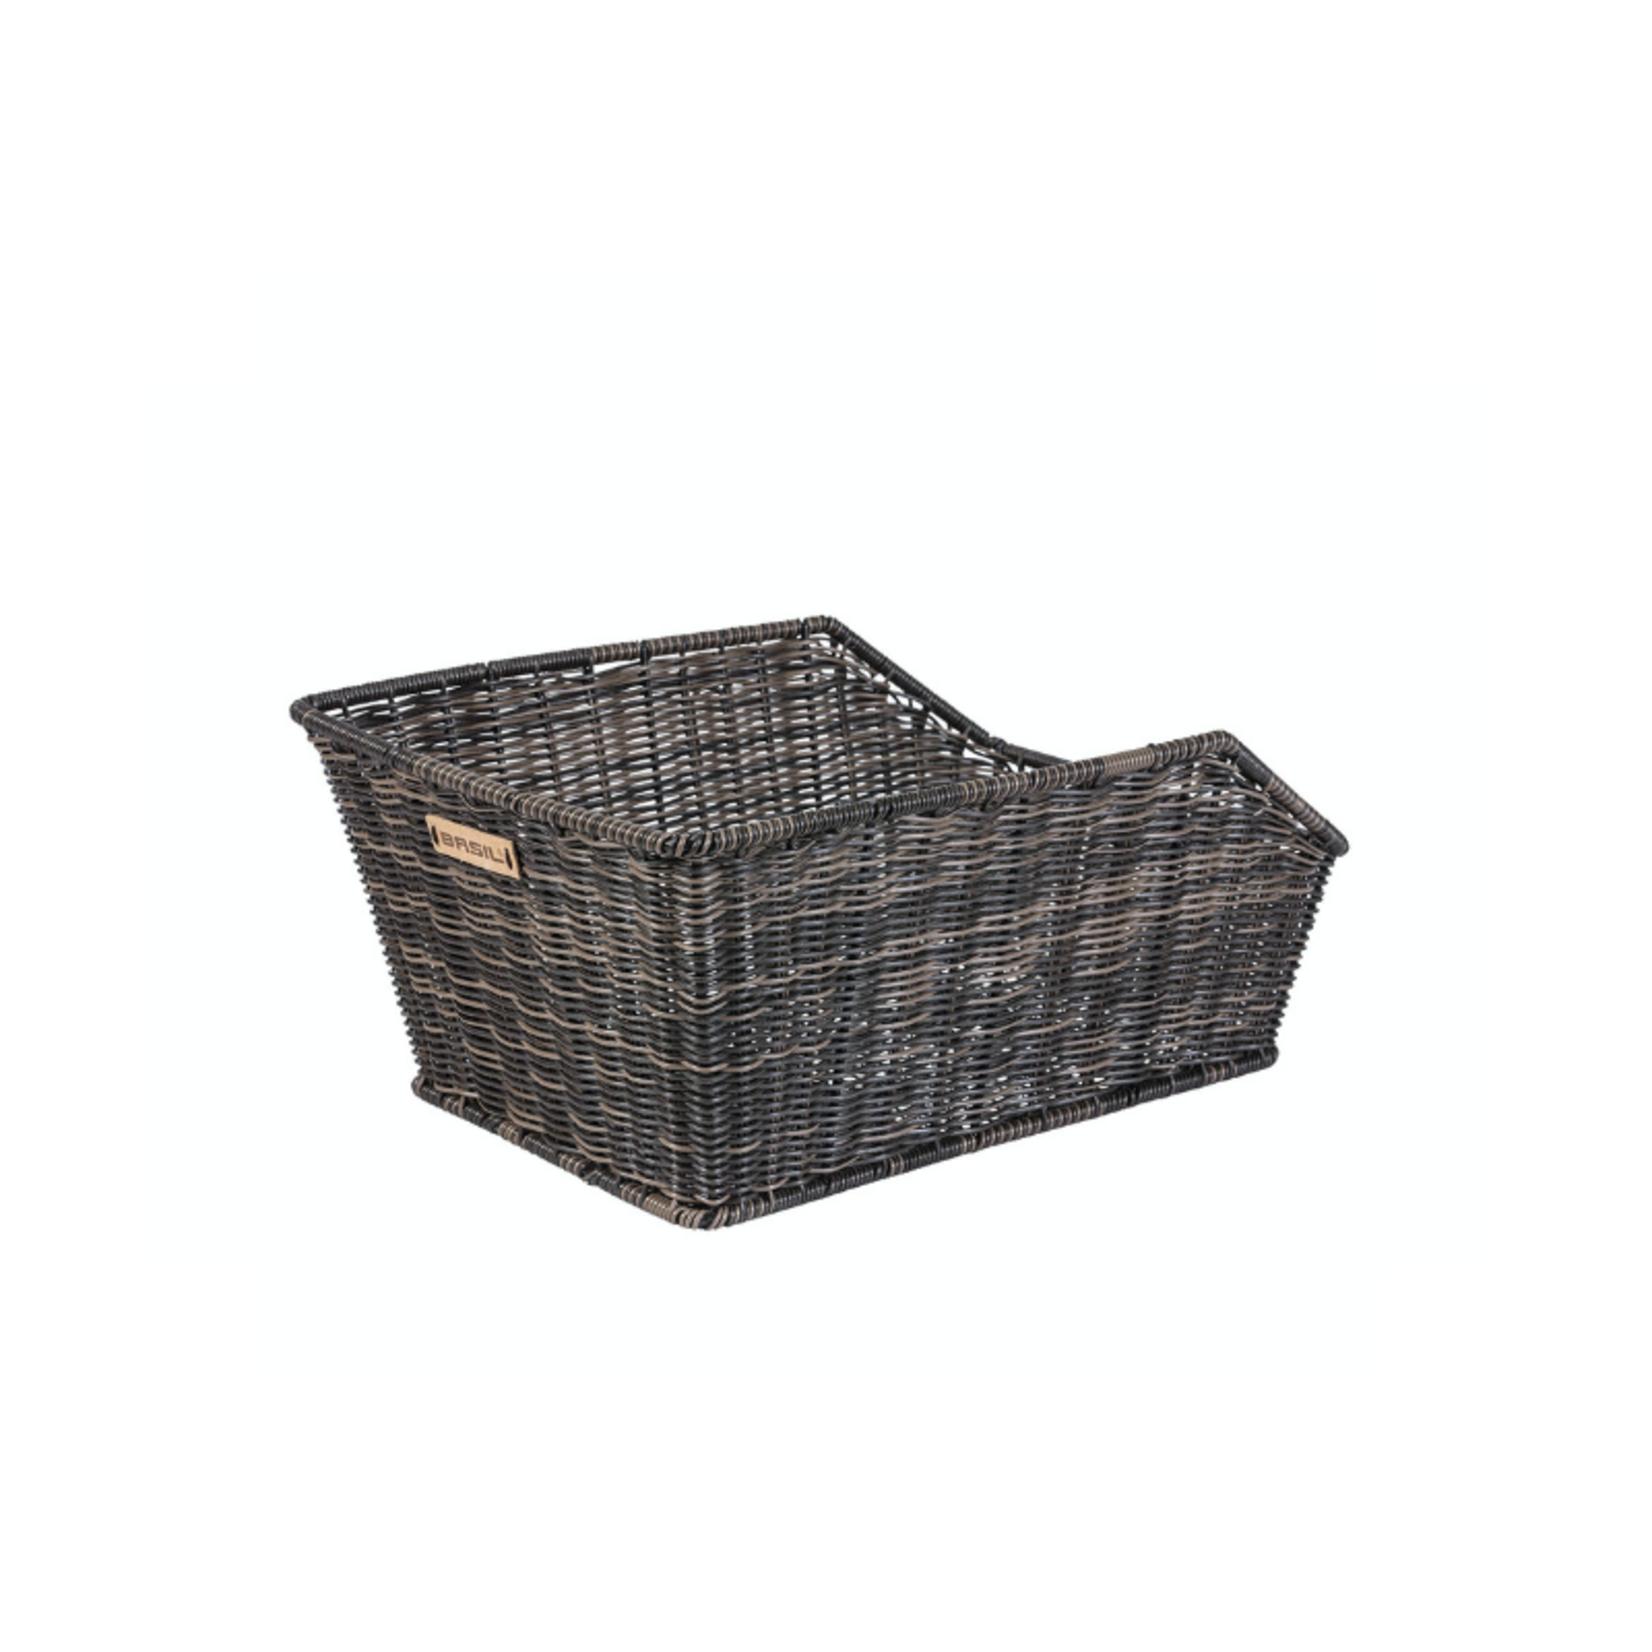 Basil Basil Cento Rear Basket Rattan Look